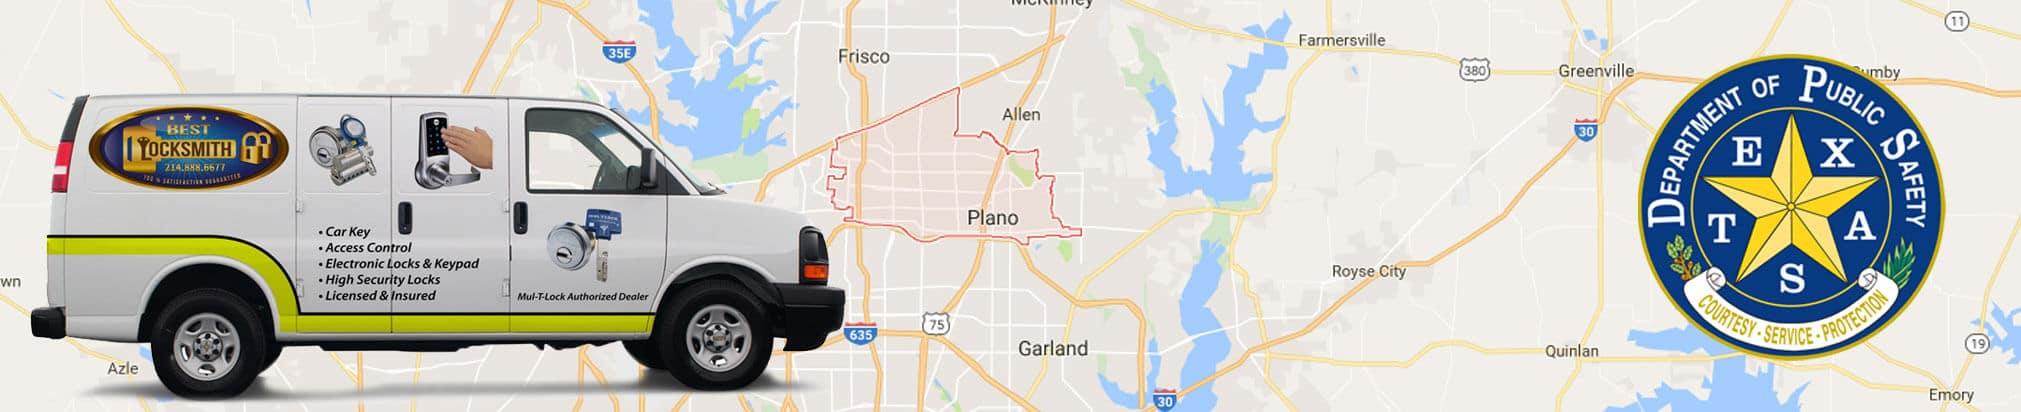 Plano Texas Locksmith Services